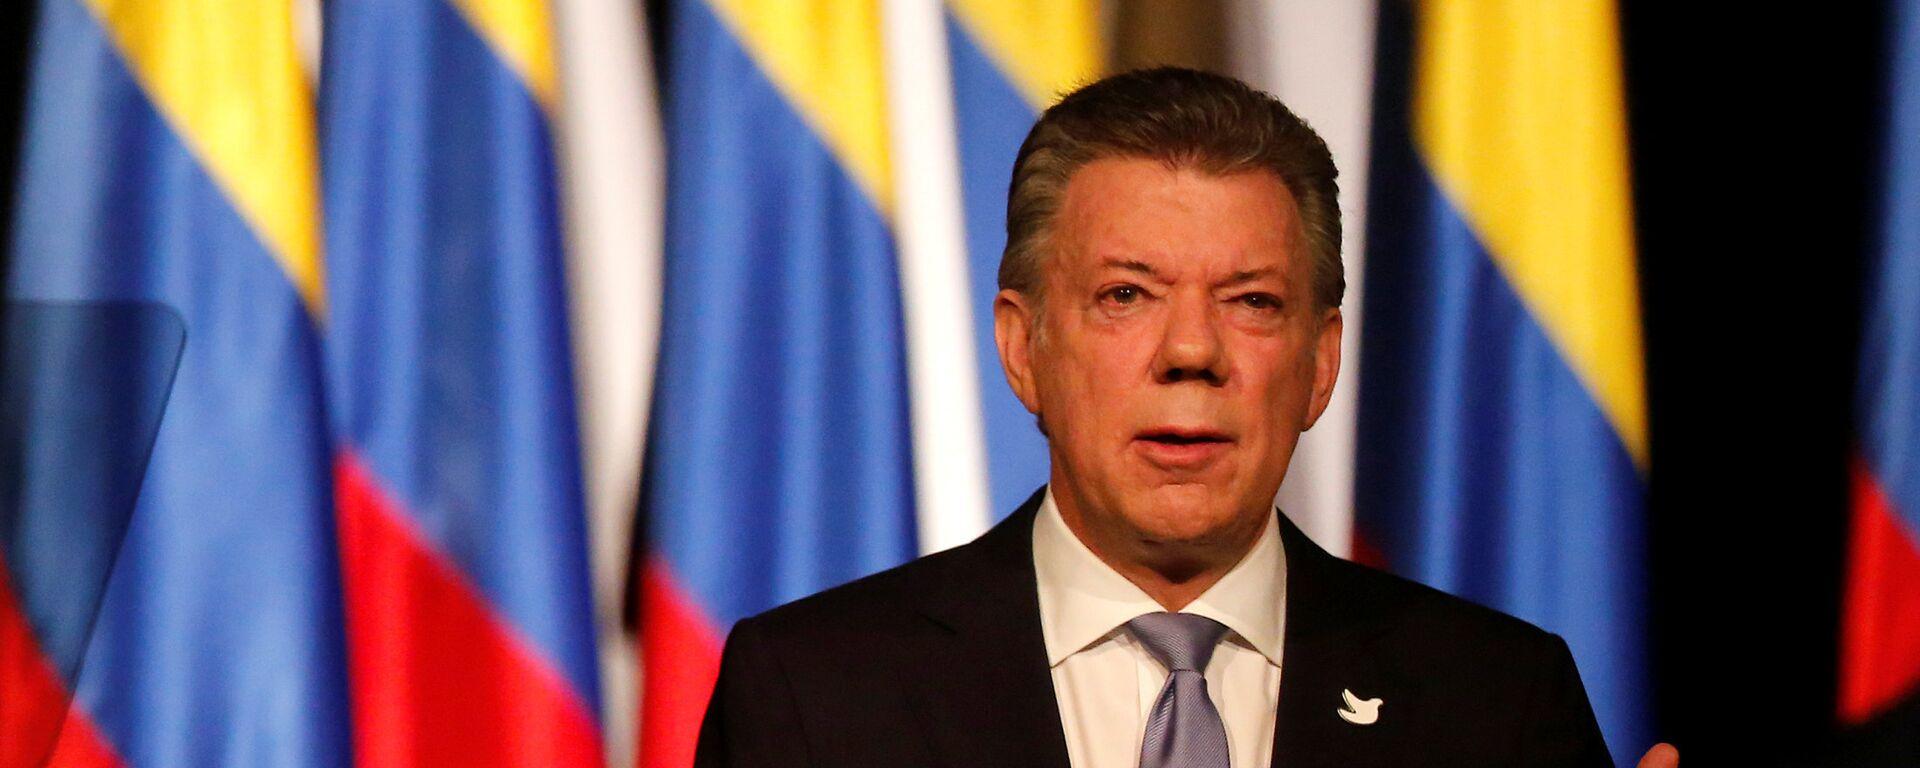 Juan Manuel Santos, expresidente de Colombia (Archivo) - Sputnik Mundo, 1920, 11.06.2021